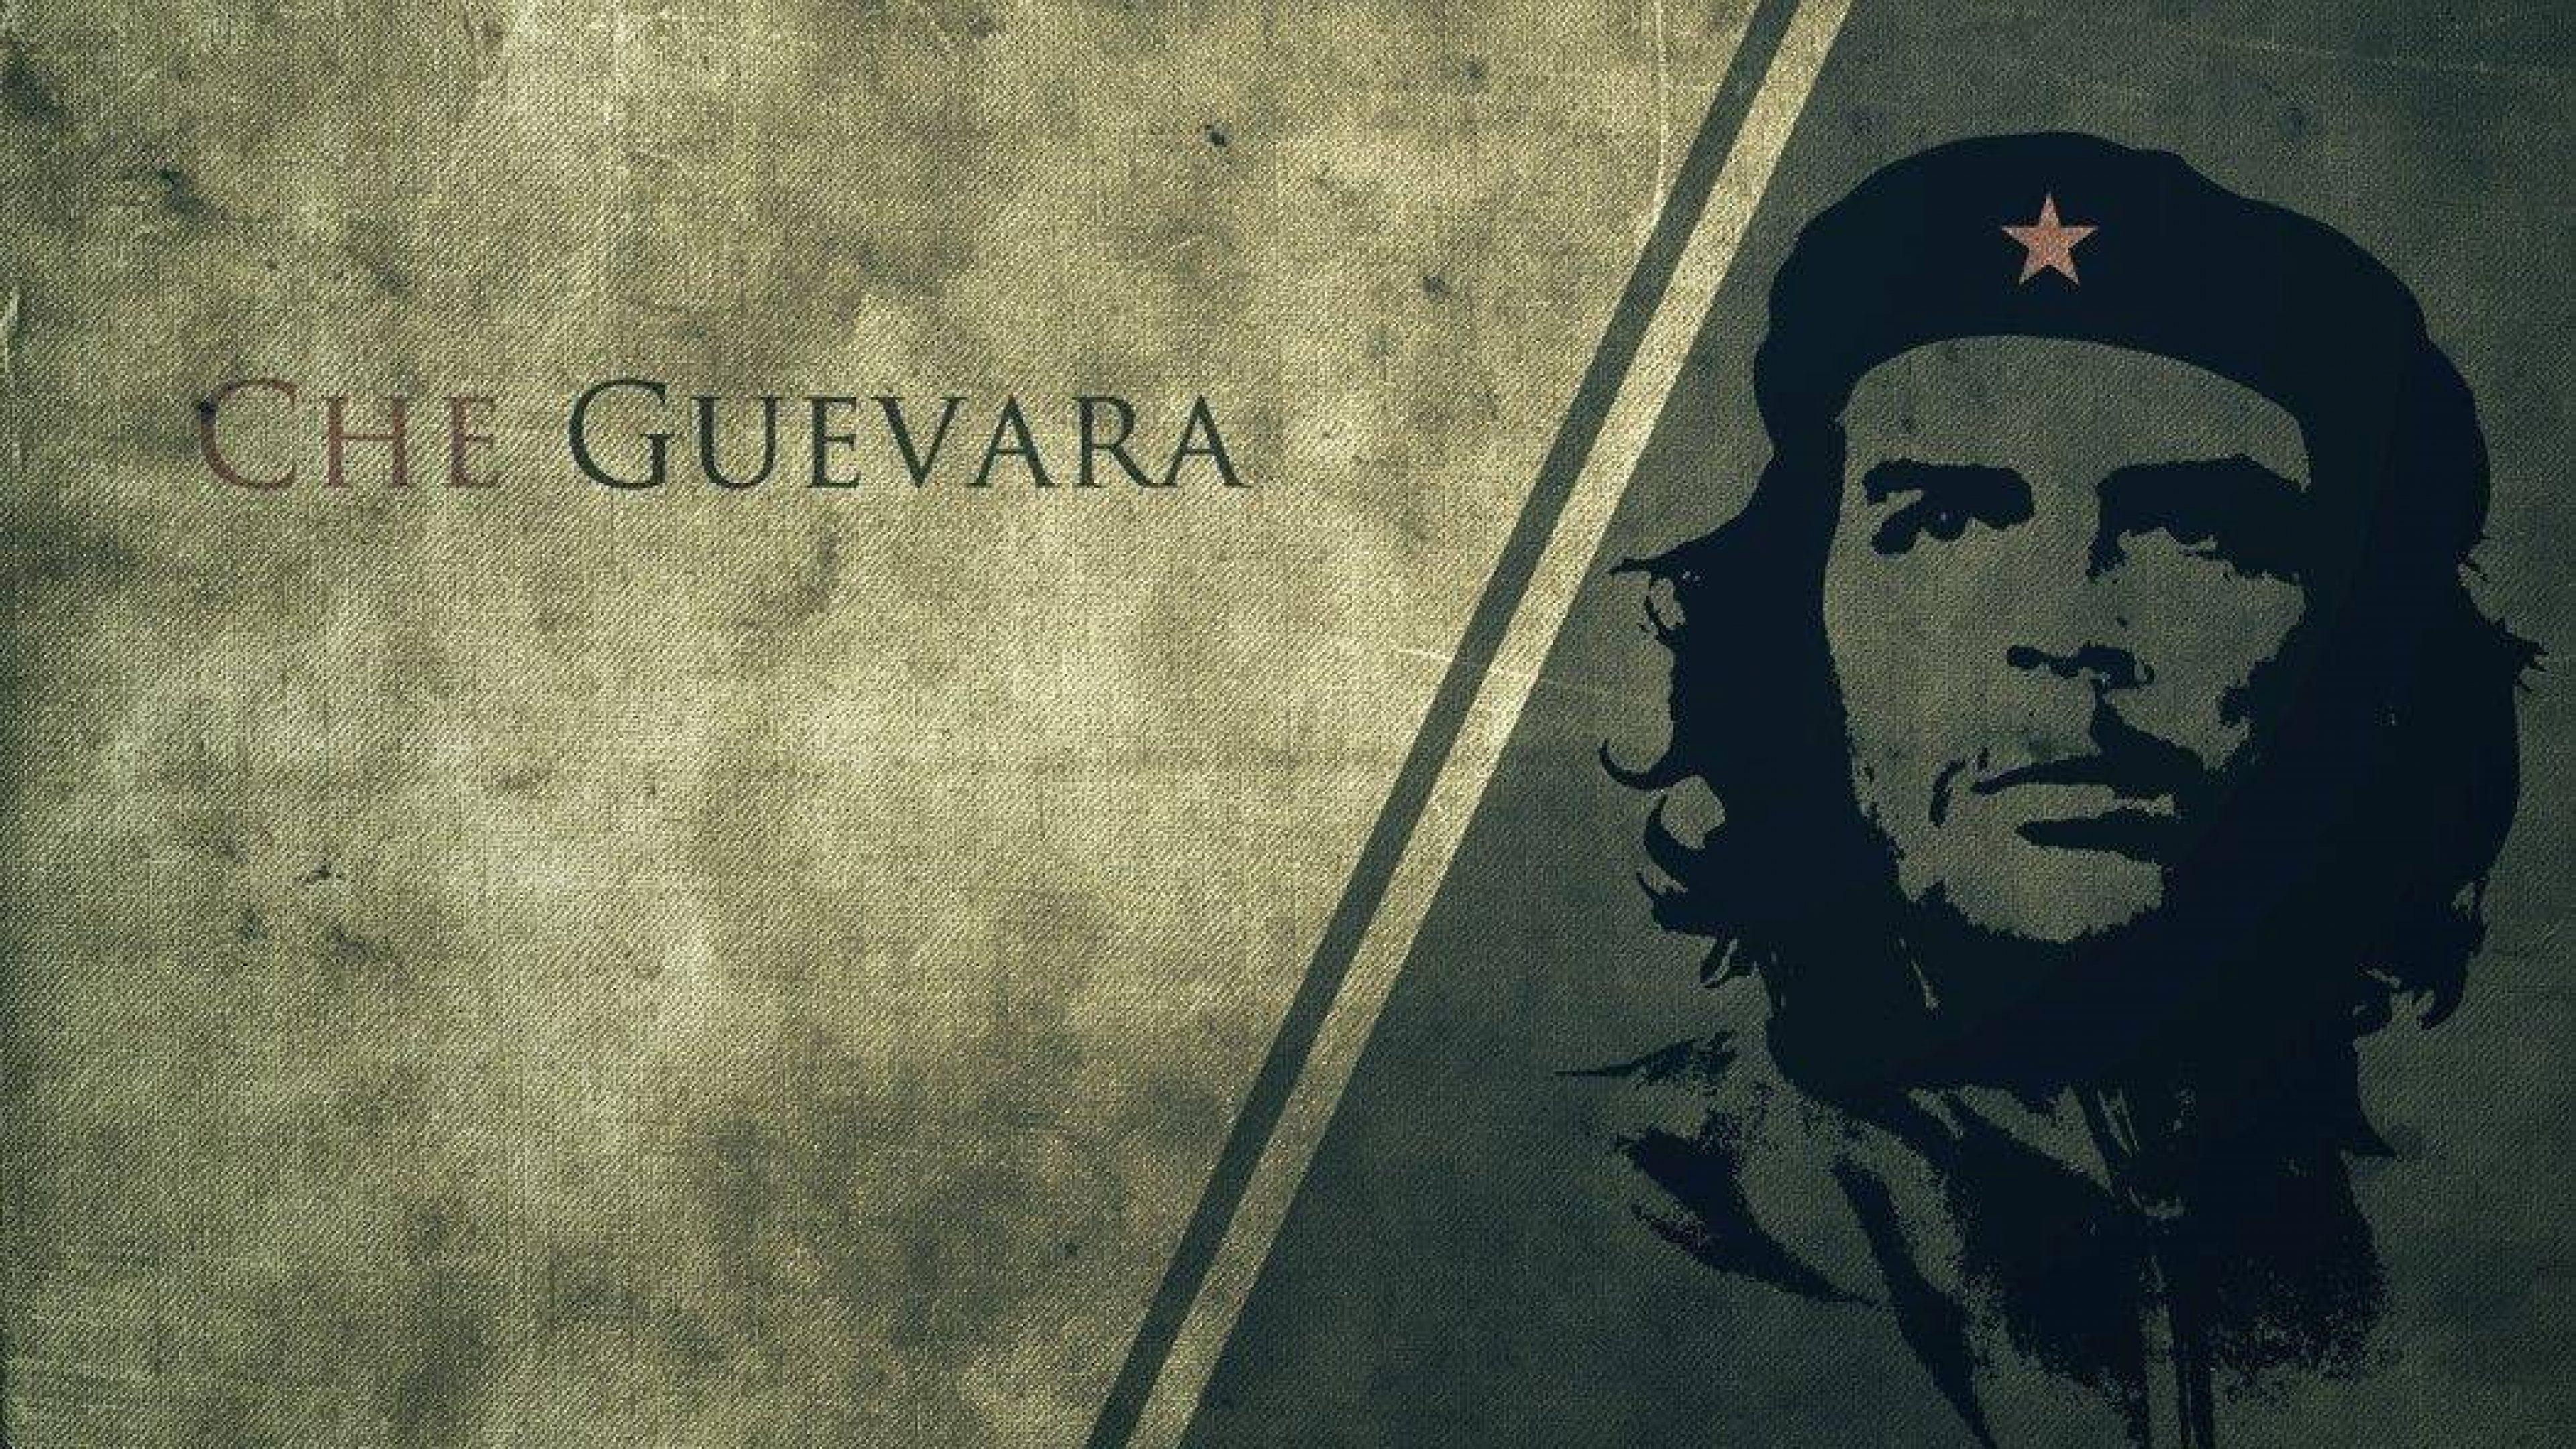 Hd Wallpaper Of Che Guevara HD Wallpapers 3840x2160